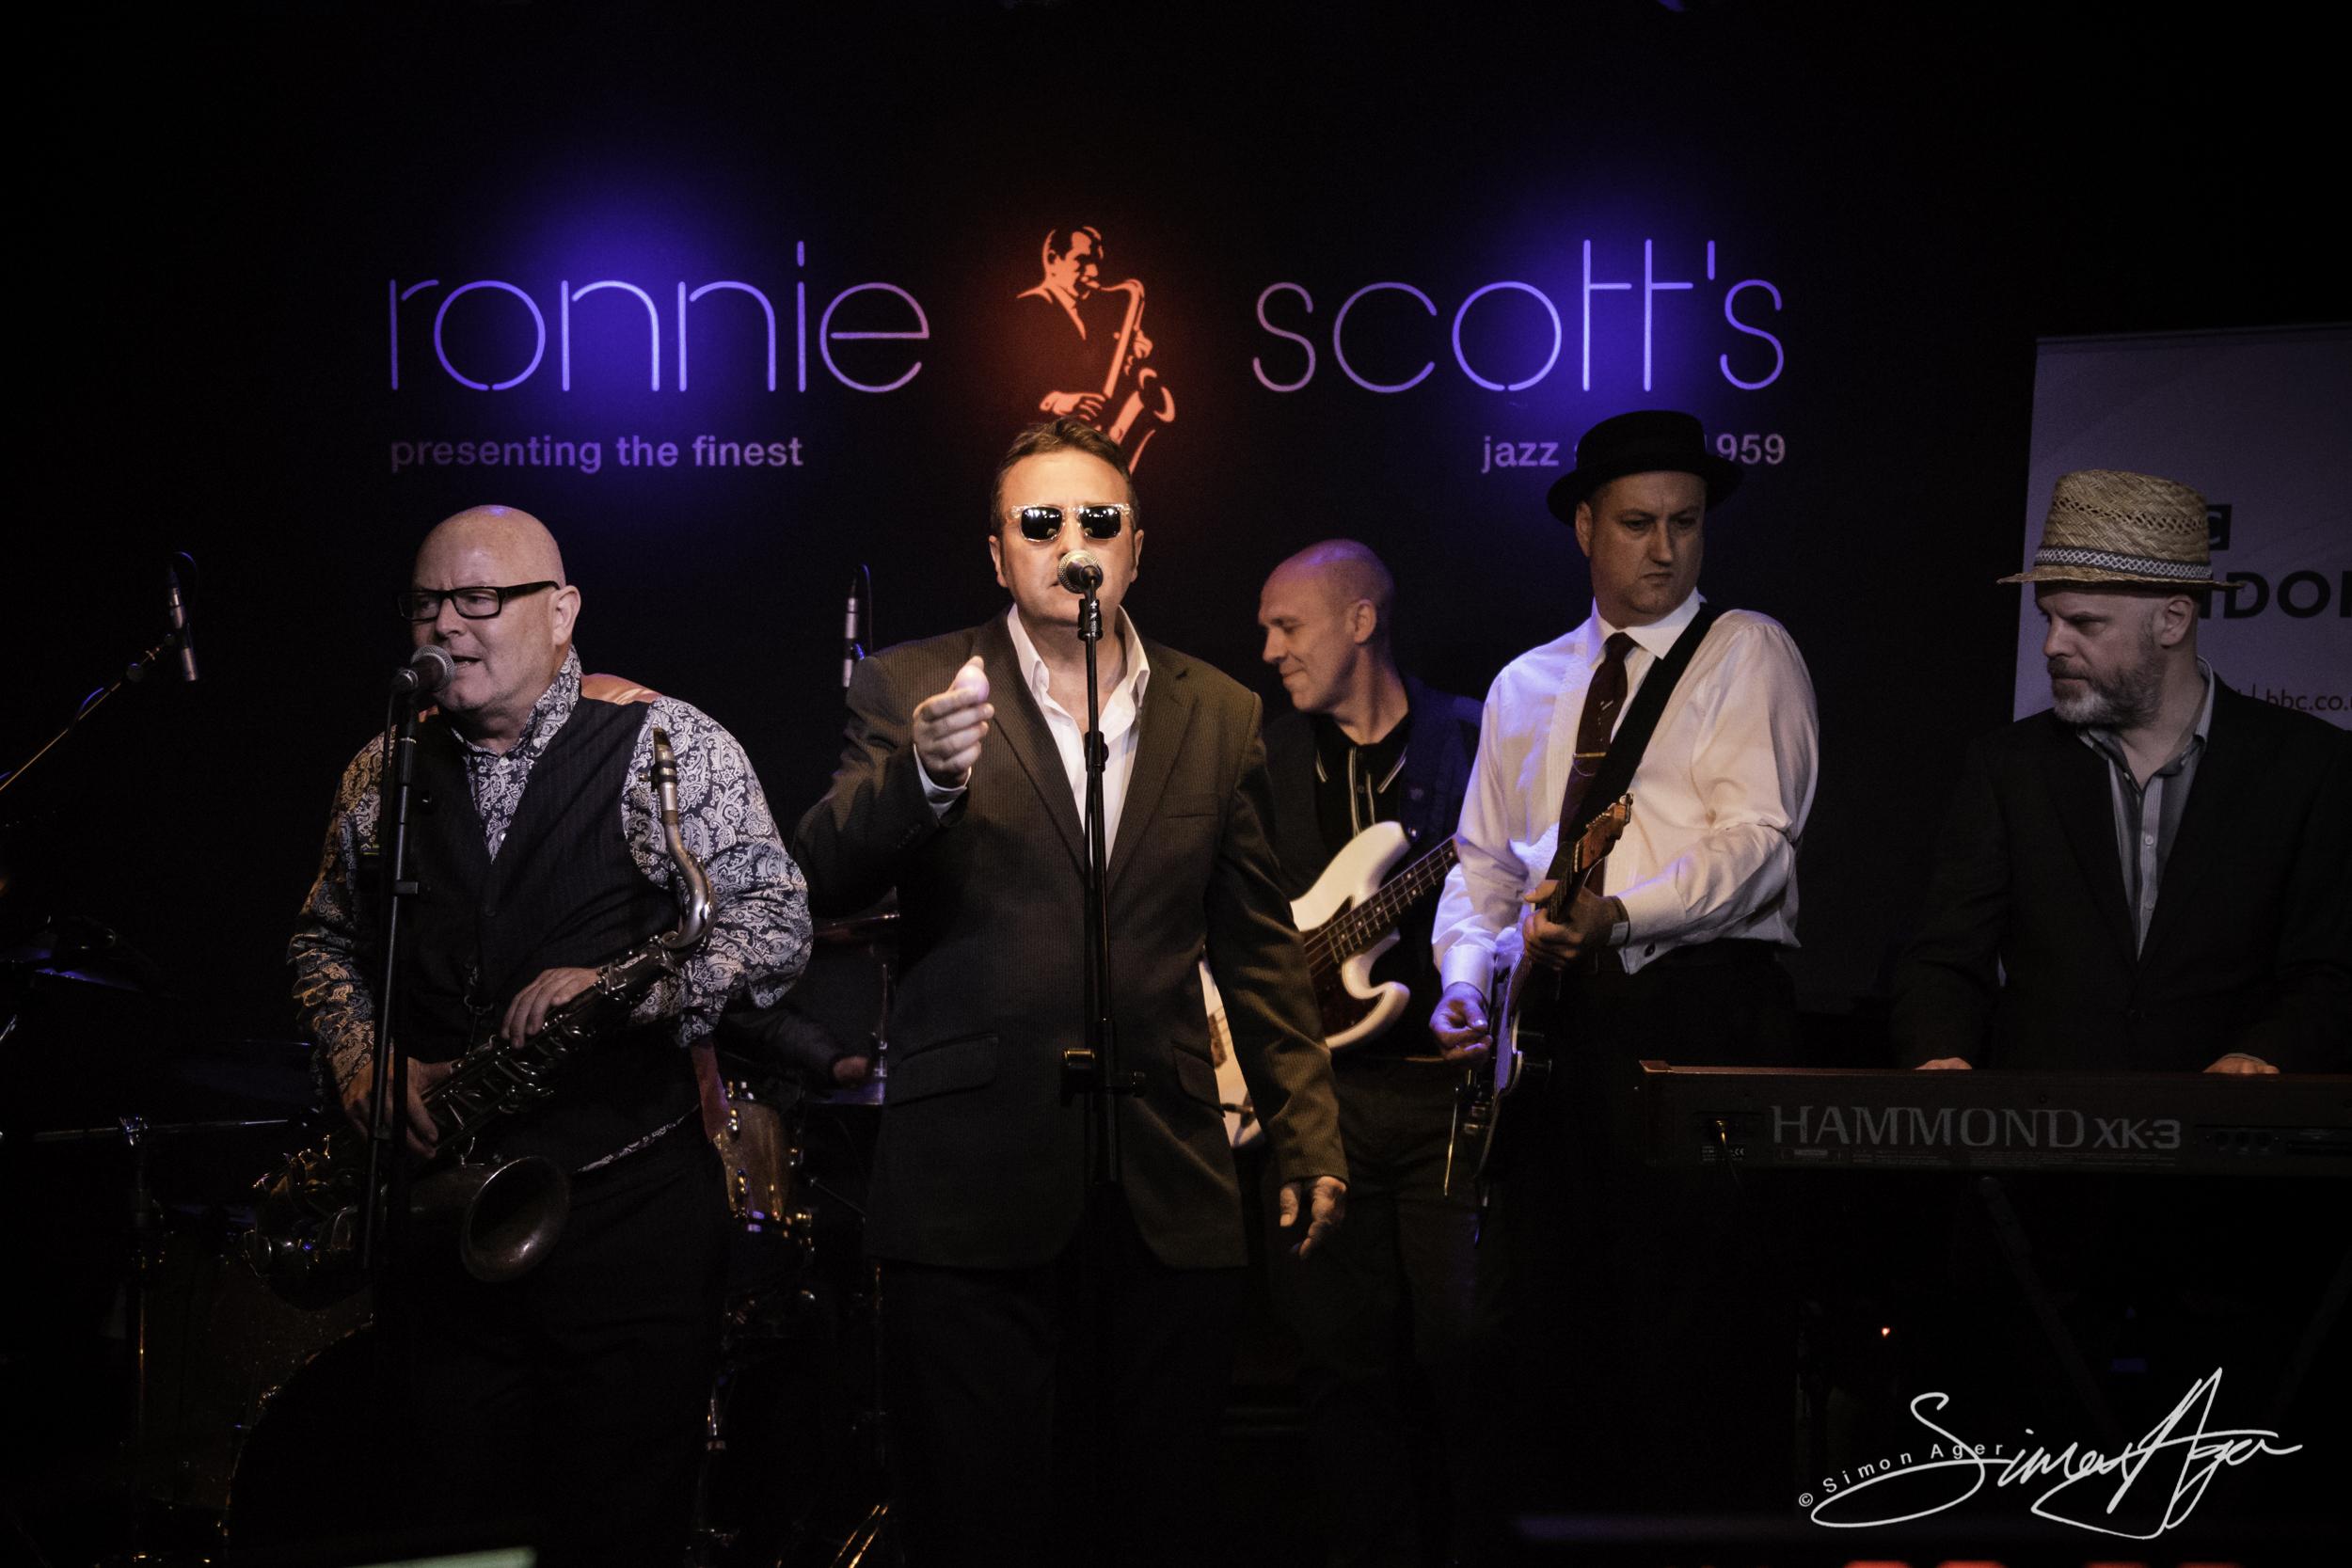 140620-SA-042-TLTSO Ronnie Scotts BBC London Gig -8459